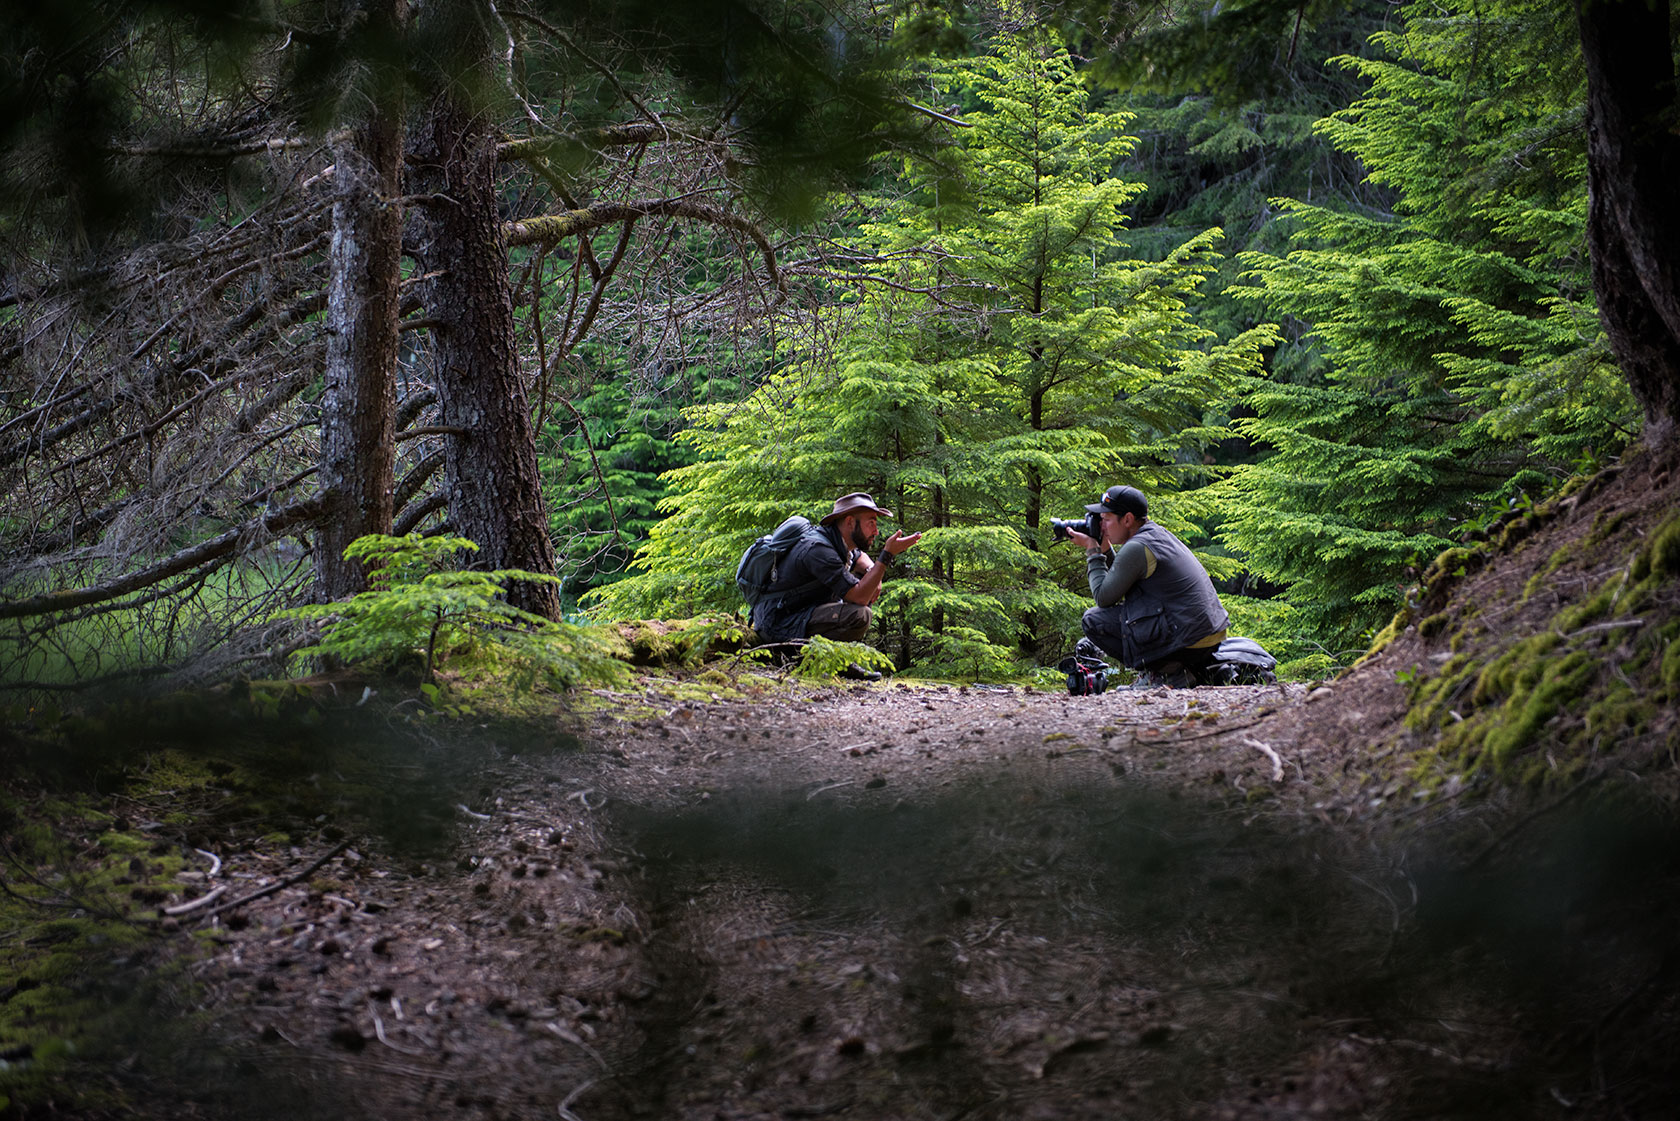 austin-trigg-brave-wilderness-orcas-island-crew-filming.jpg